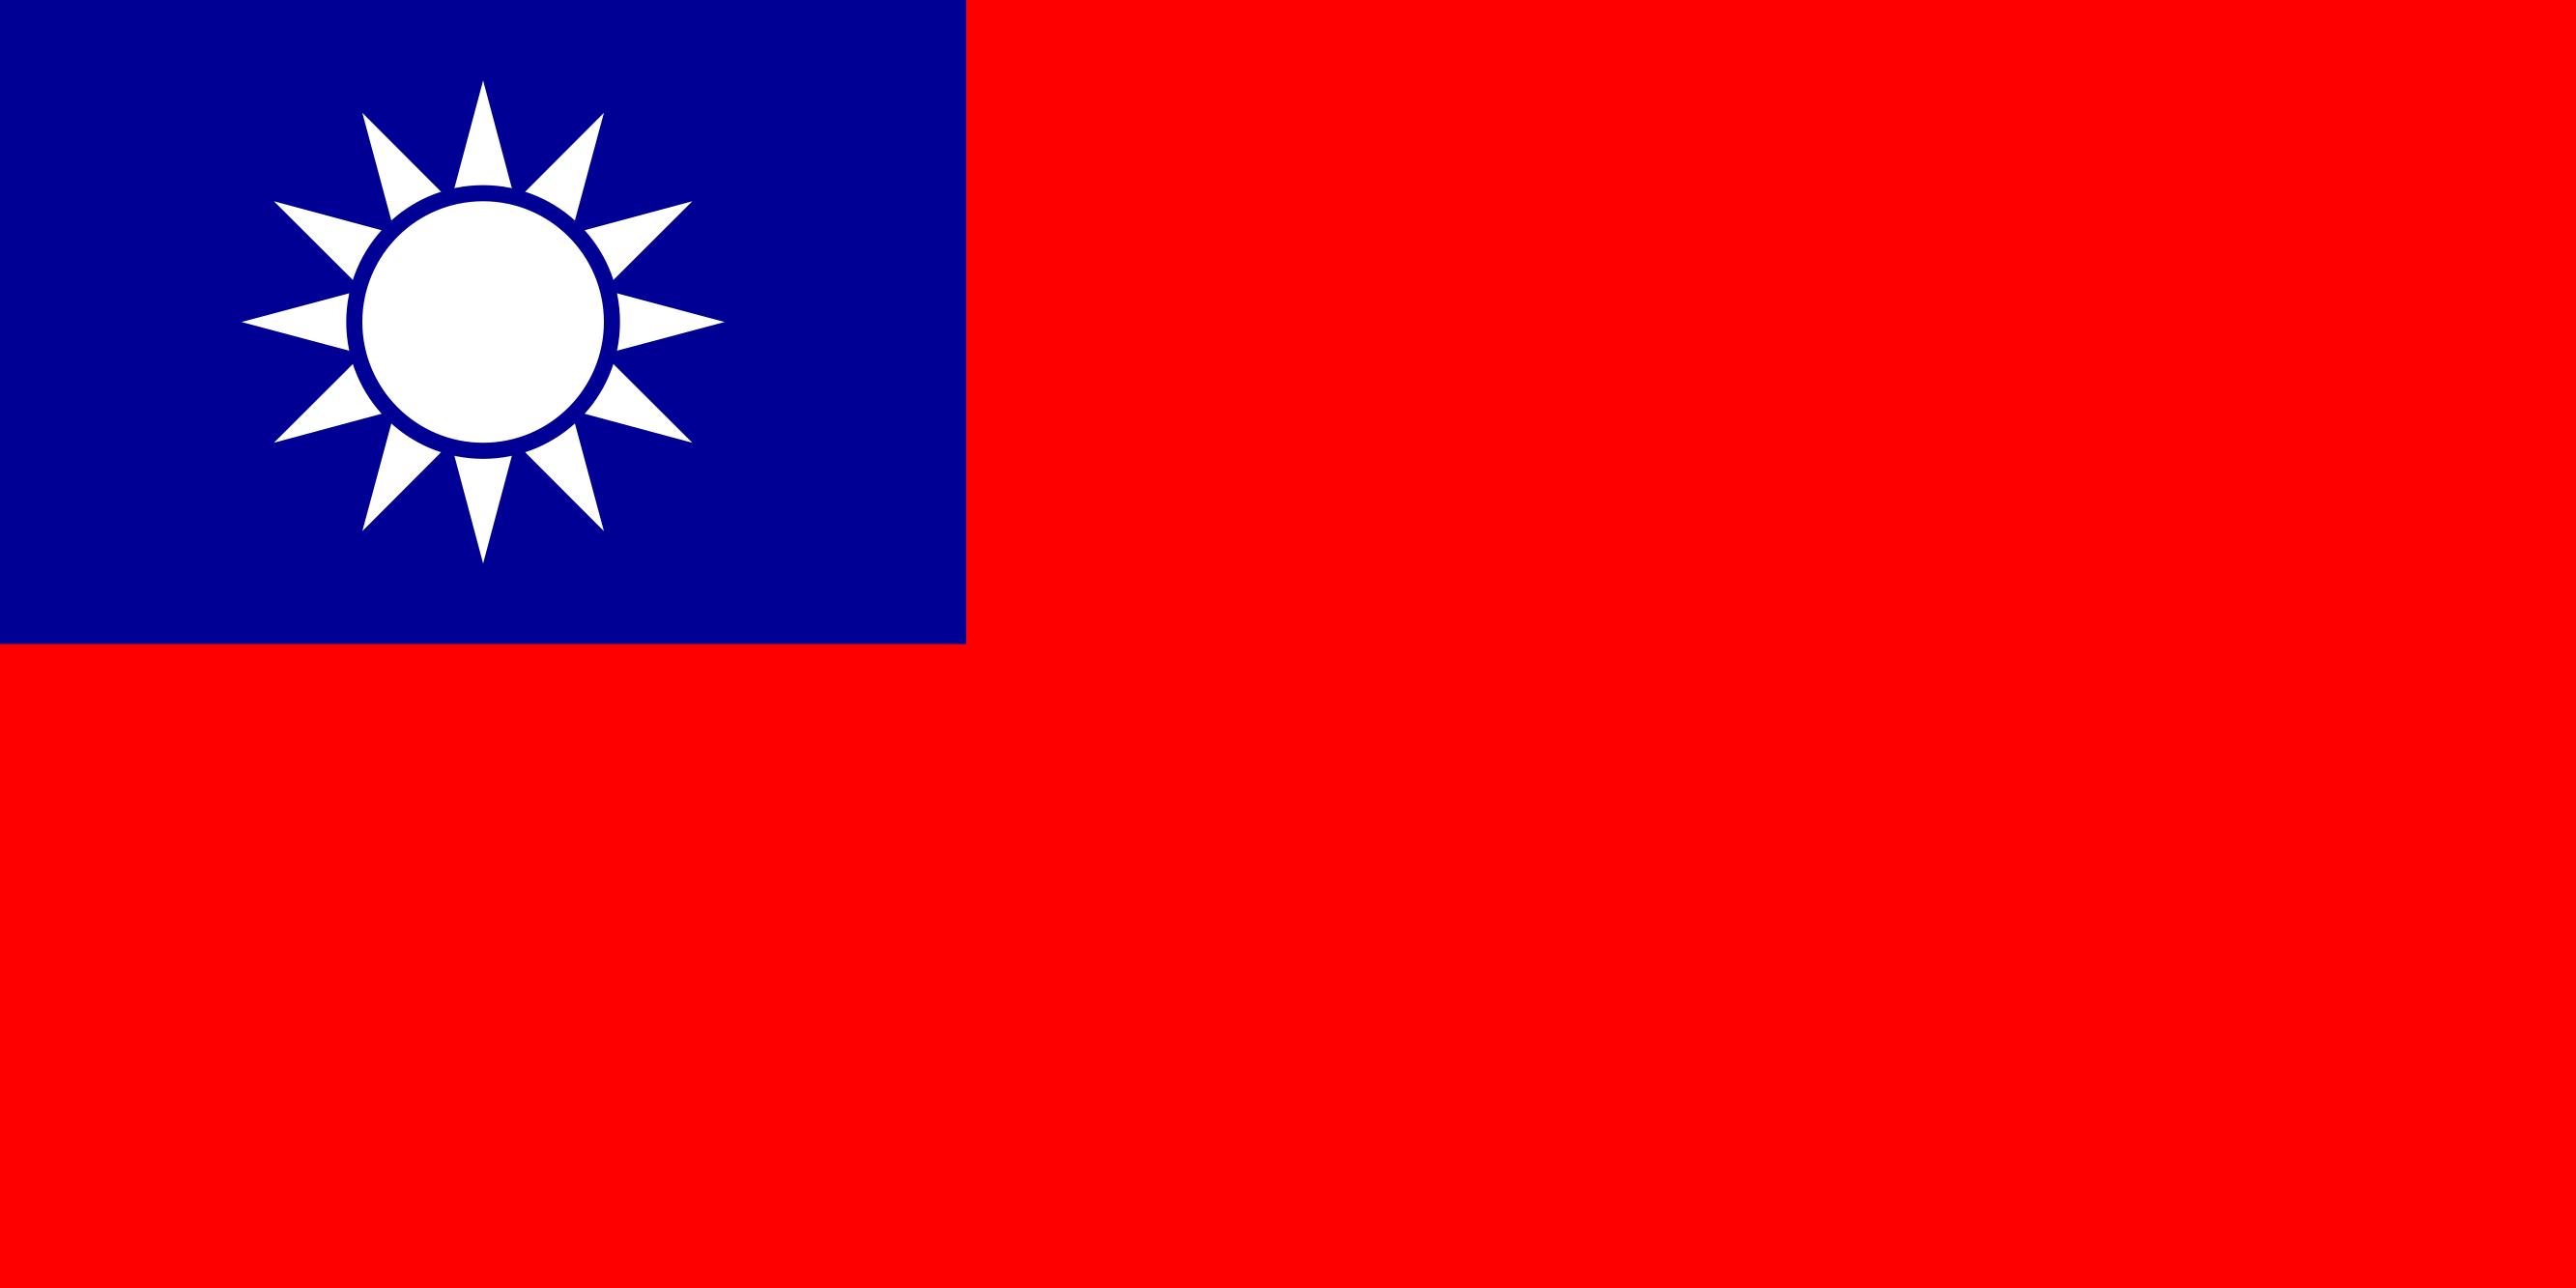 taiwan_flag